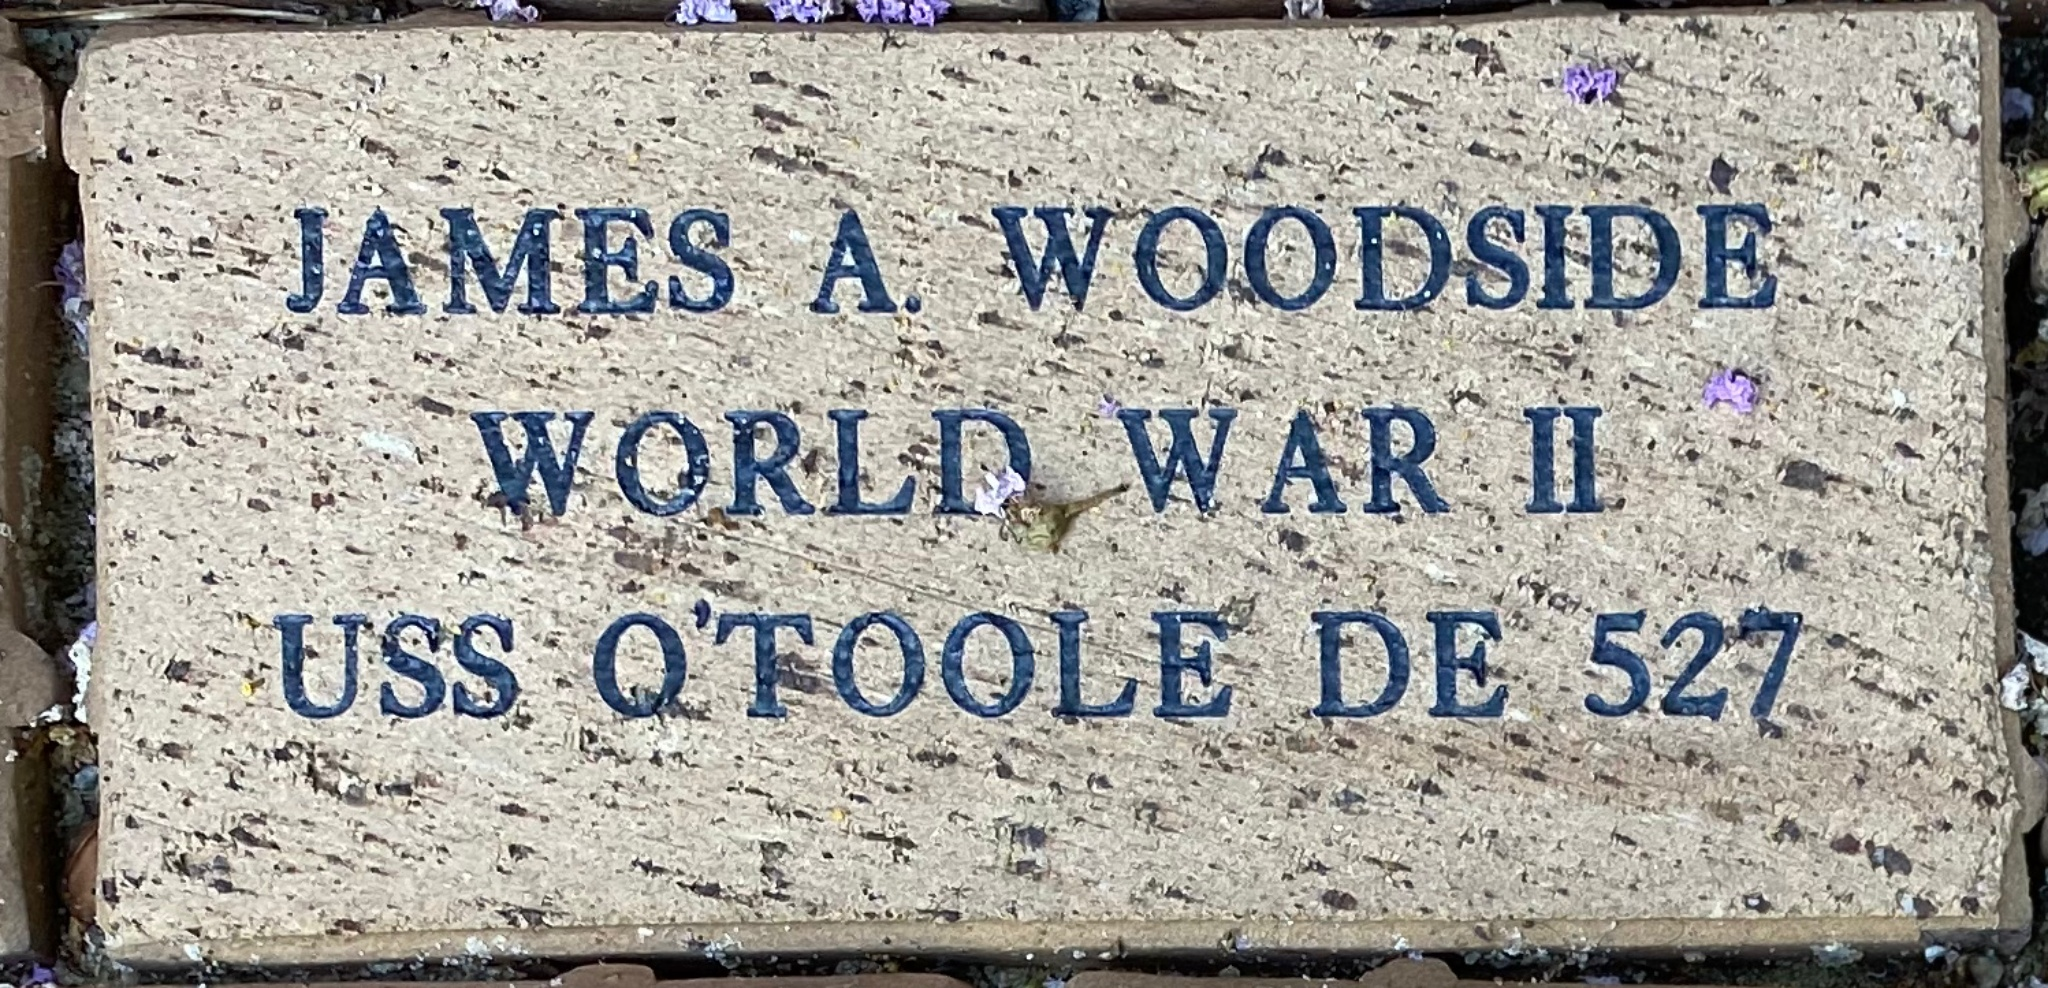 JAMES A. WOODSIDE WORLD WAR II USS O''TOOLE DE 527